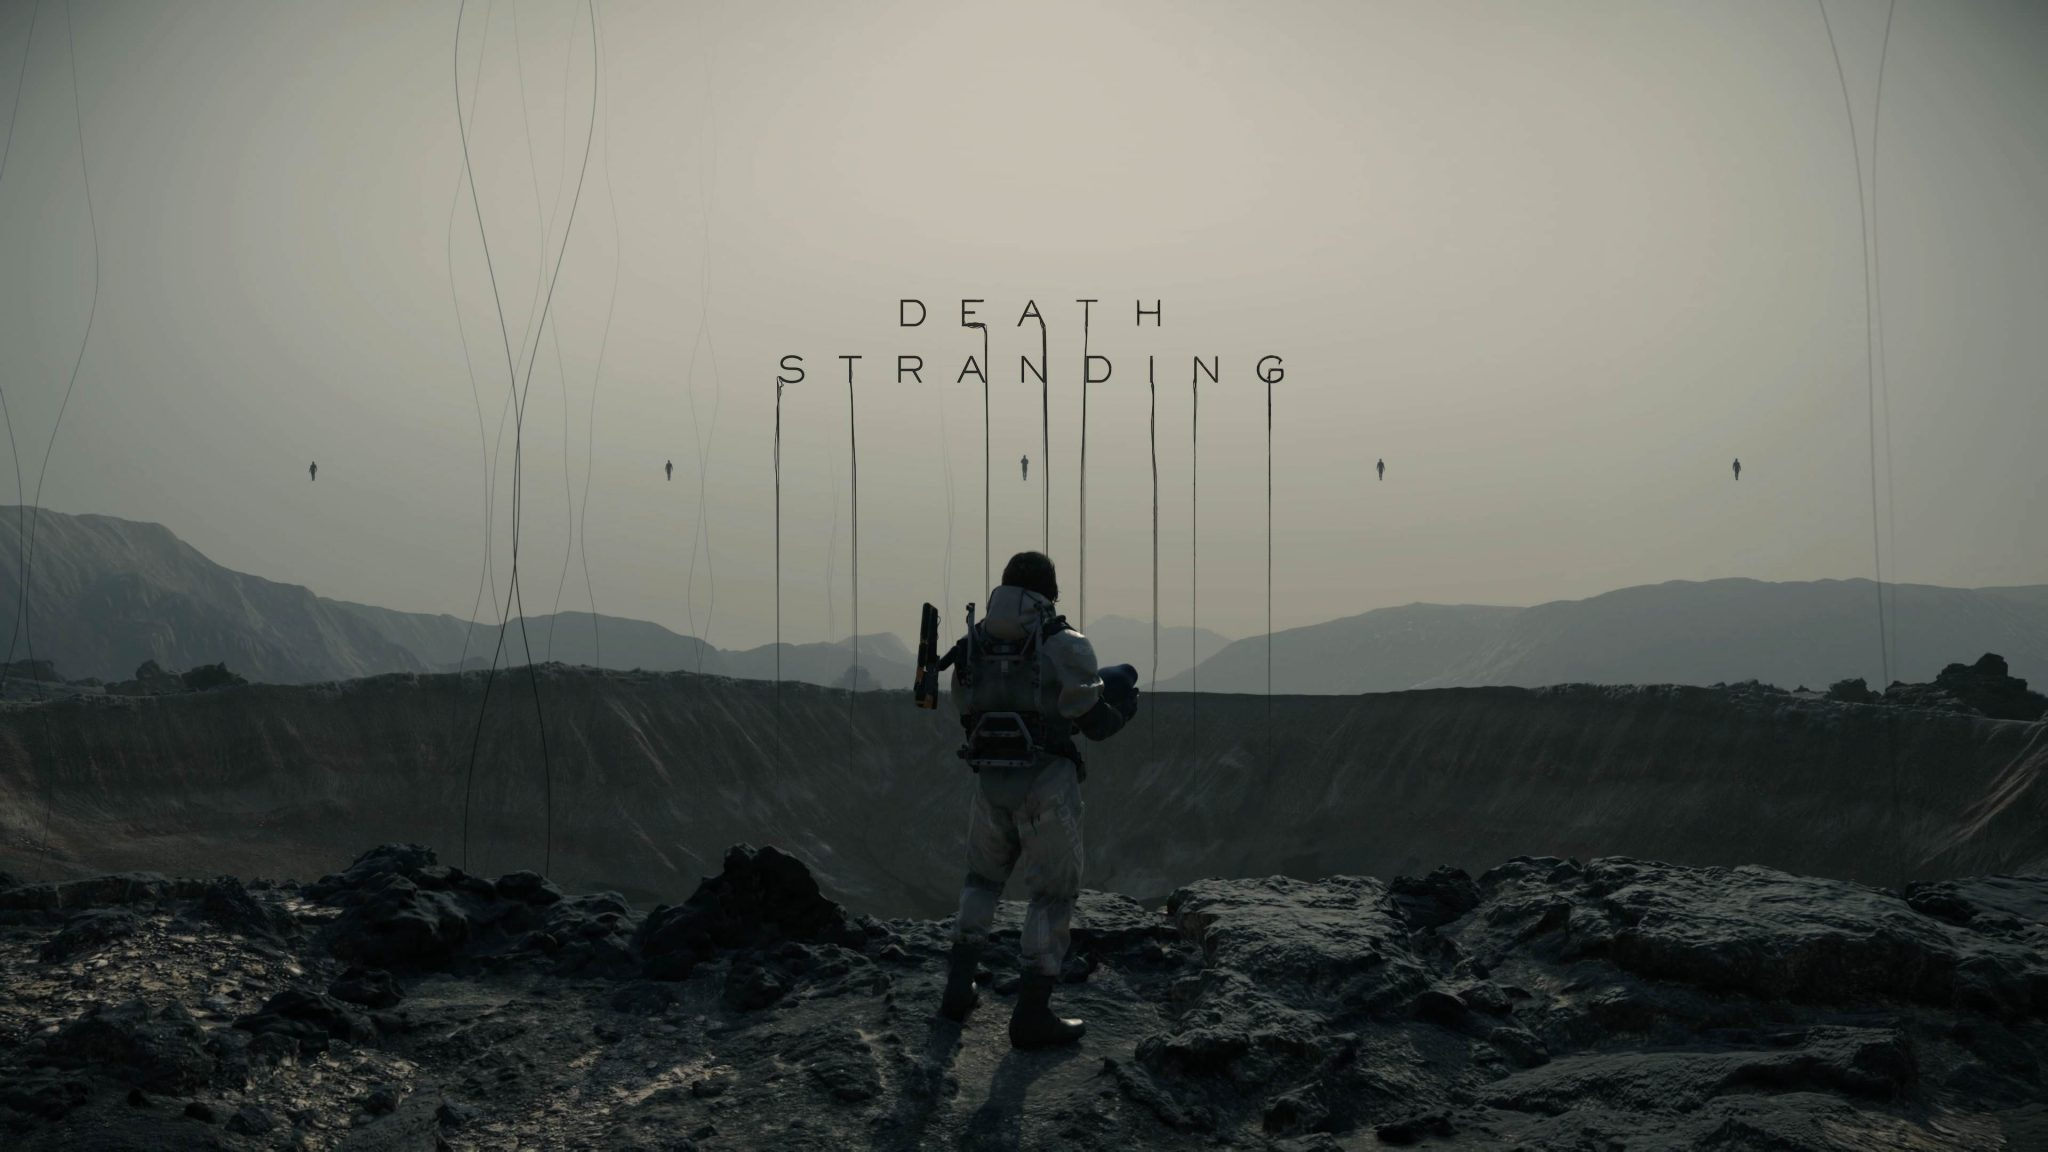 Death stranding capa scaled